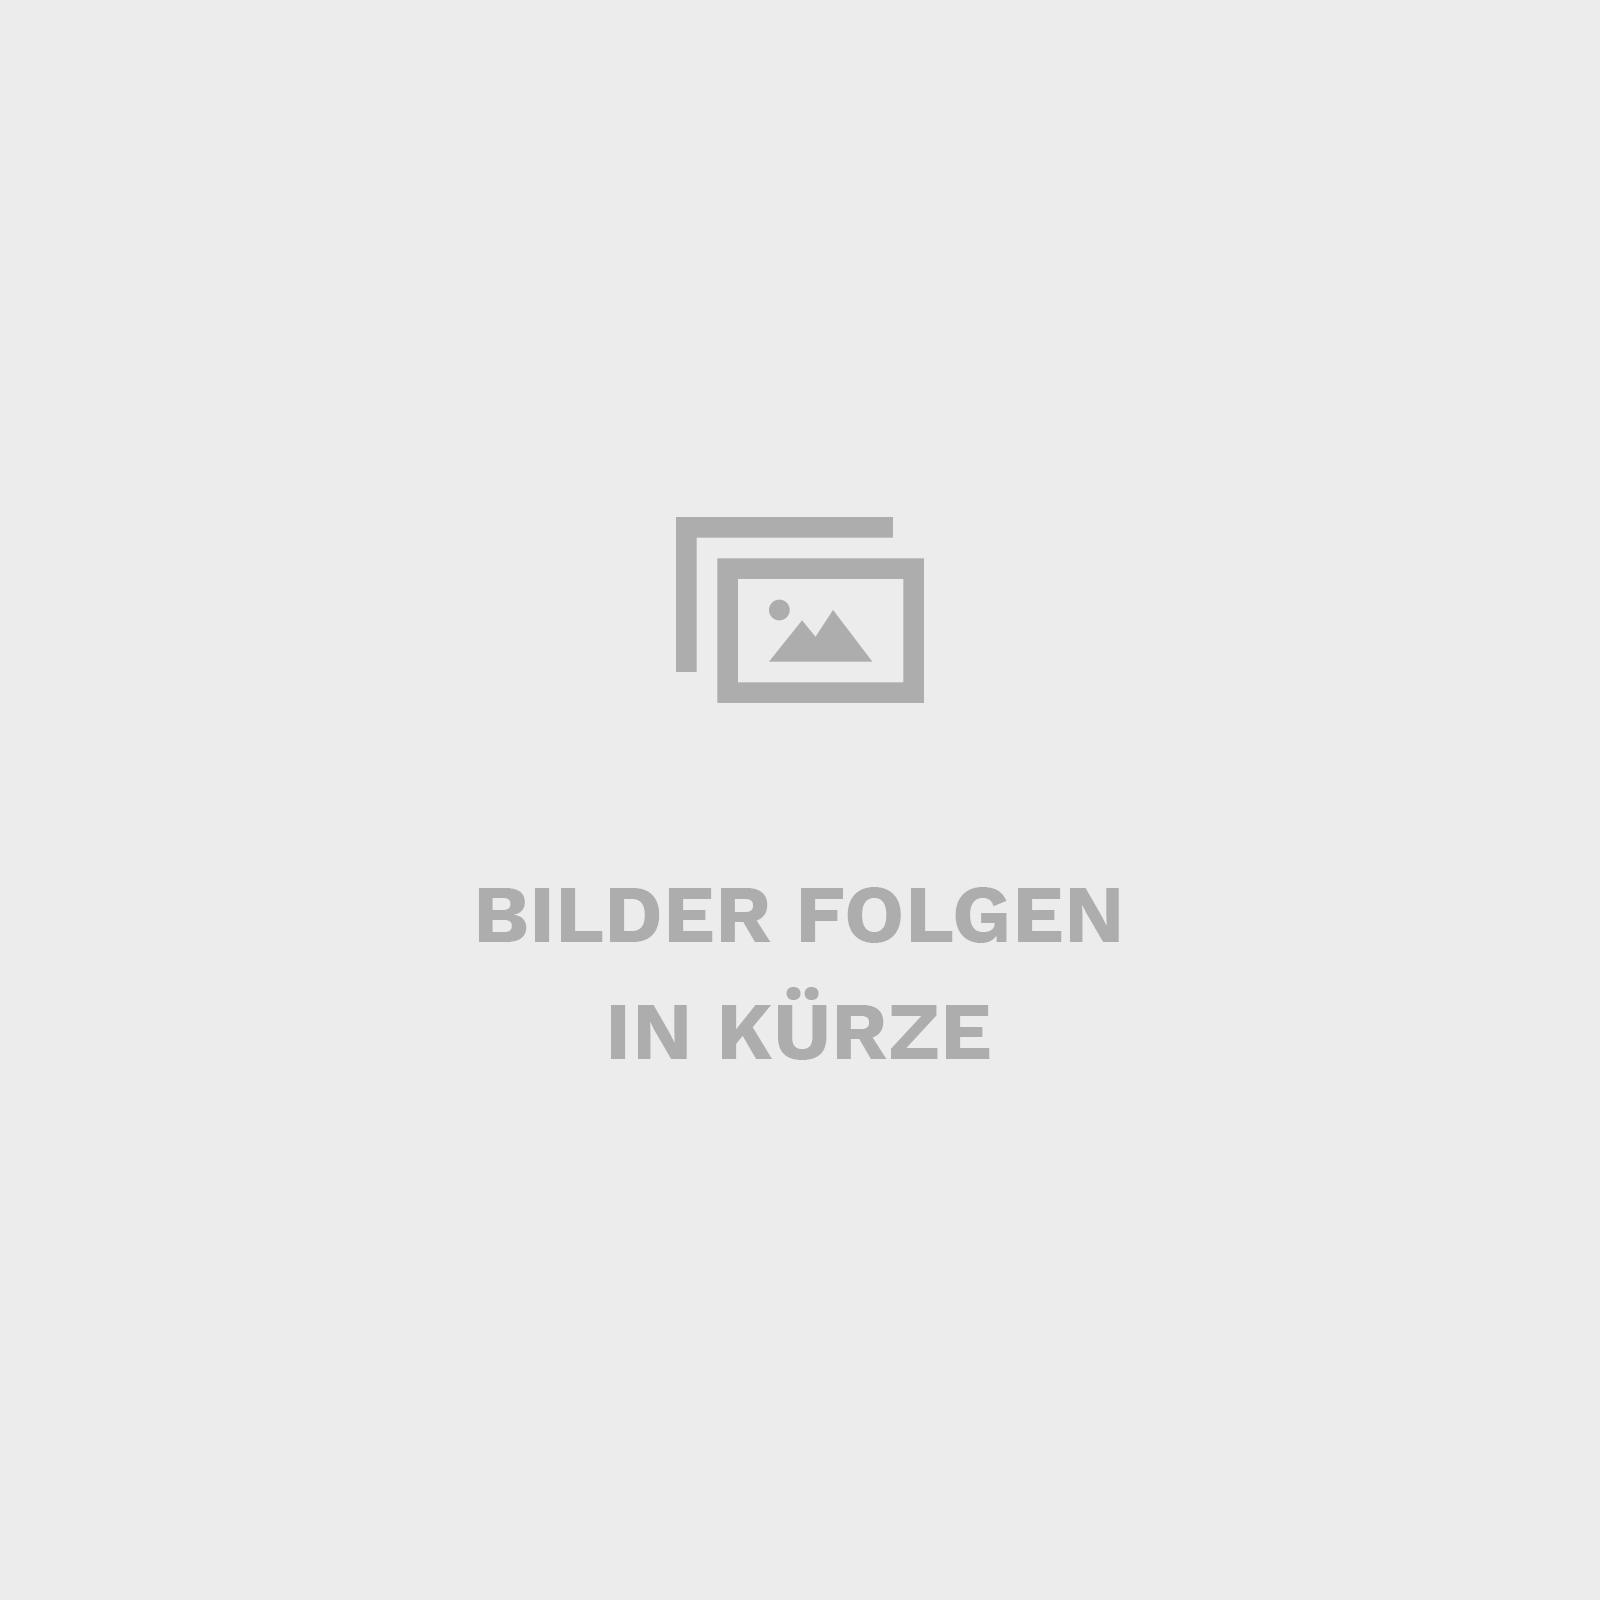 Brand van Egmond - Eve Chandelier Oval Kupfer -  Lichtgloben Kupfer